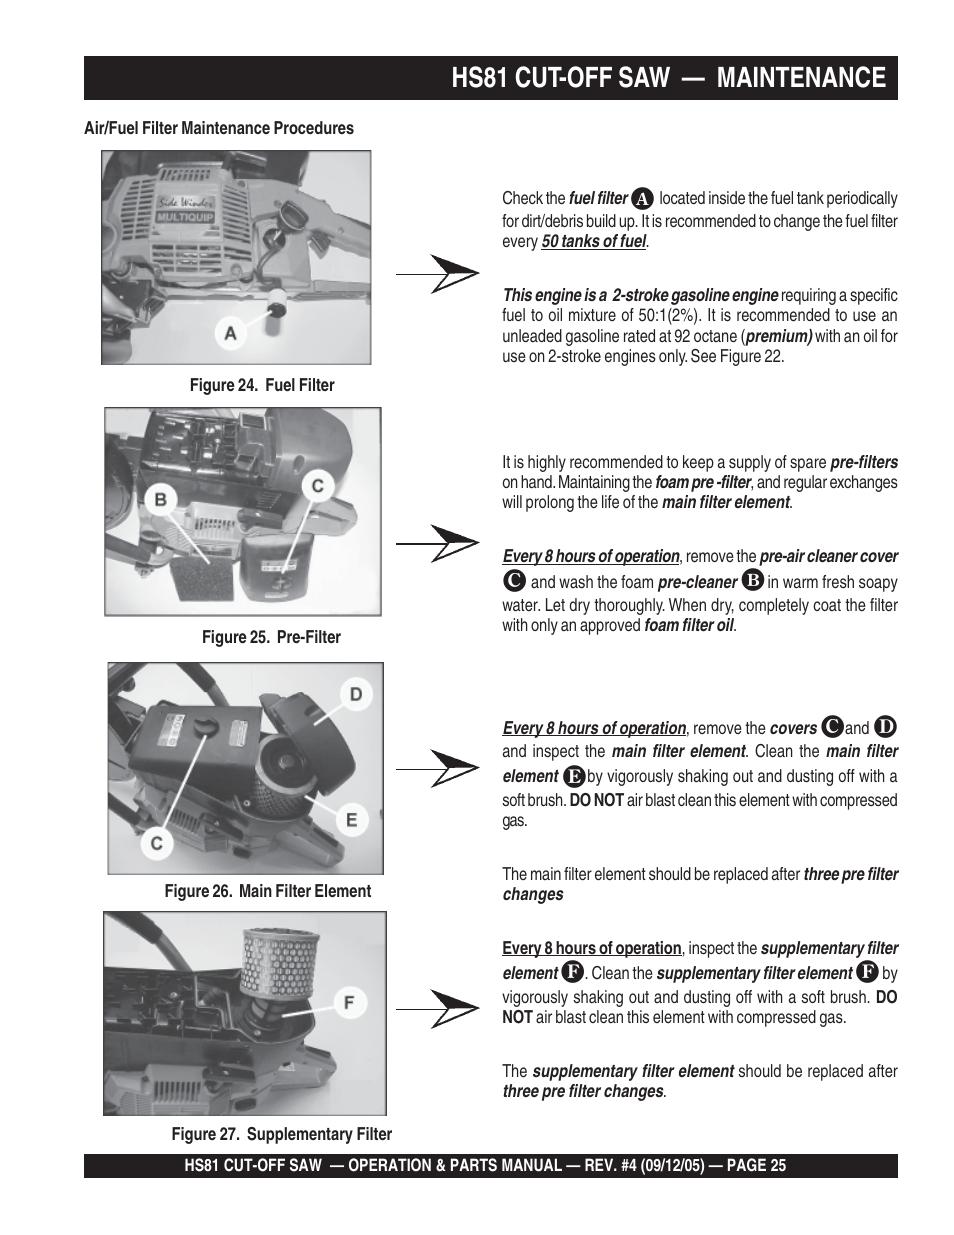 medium resolution of hs81 cut off saw maintenance multiquip sidewinder cut off saw hs81 user manual page 25 68